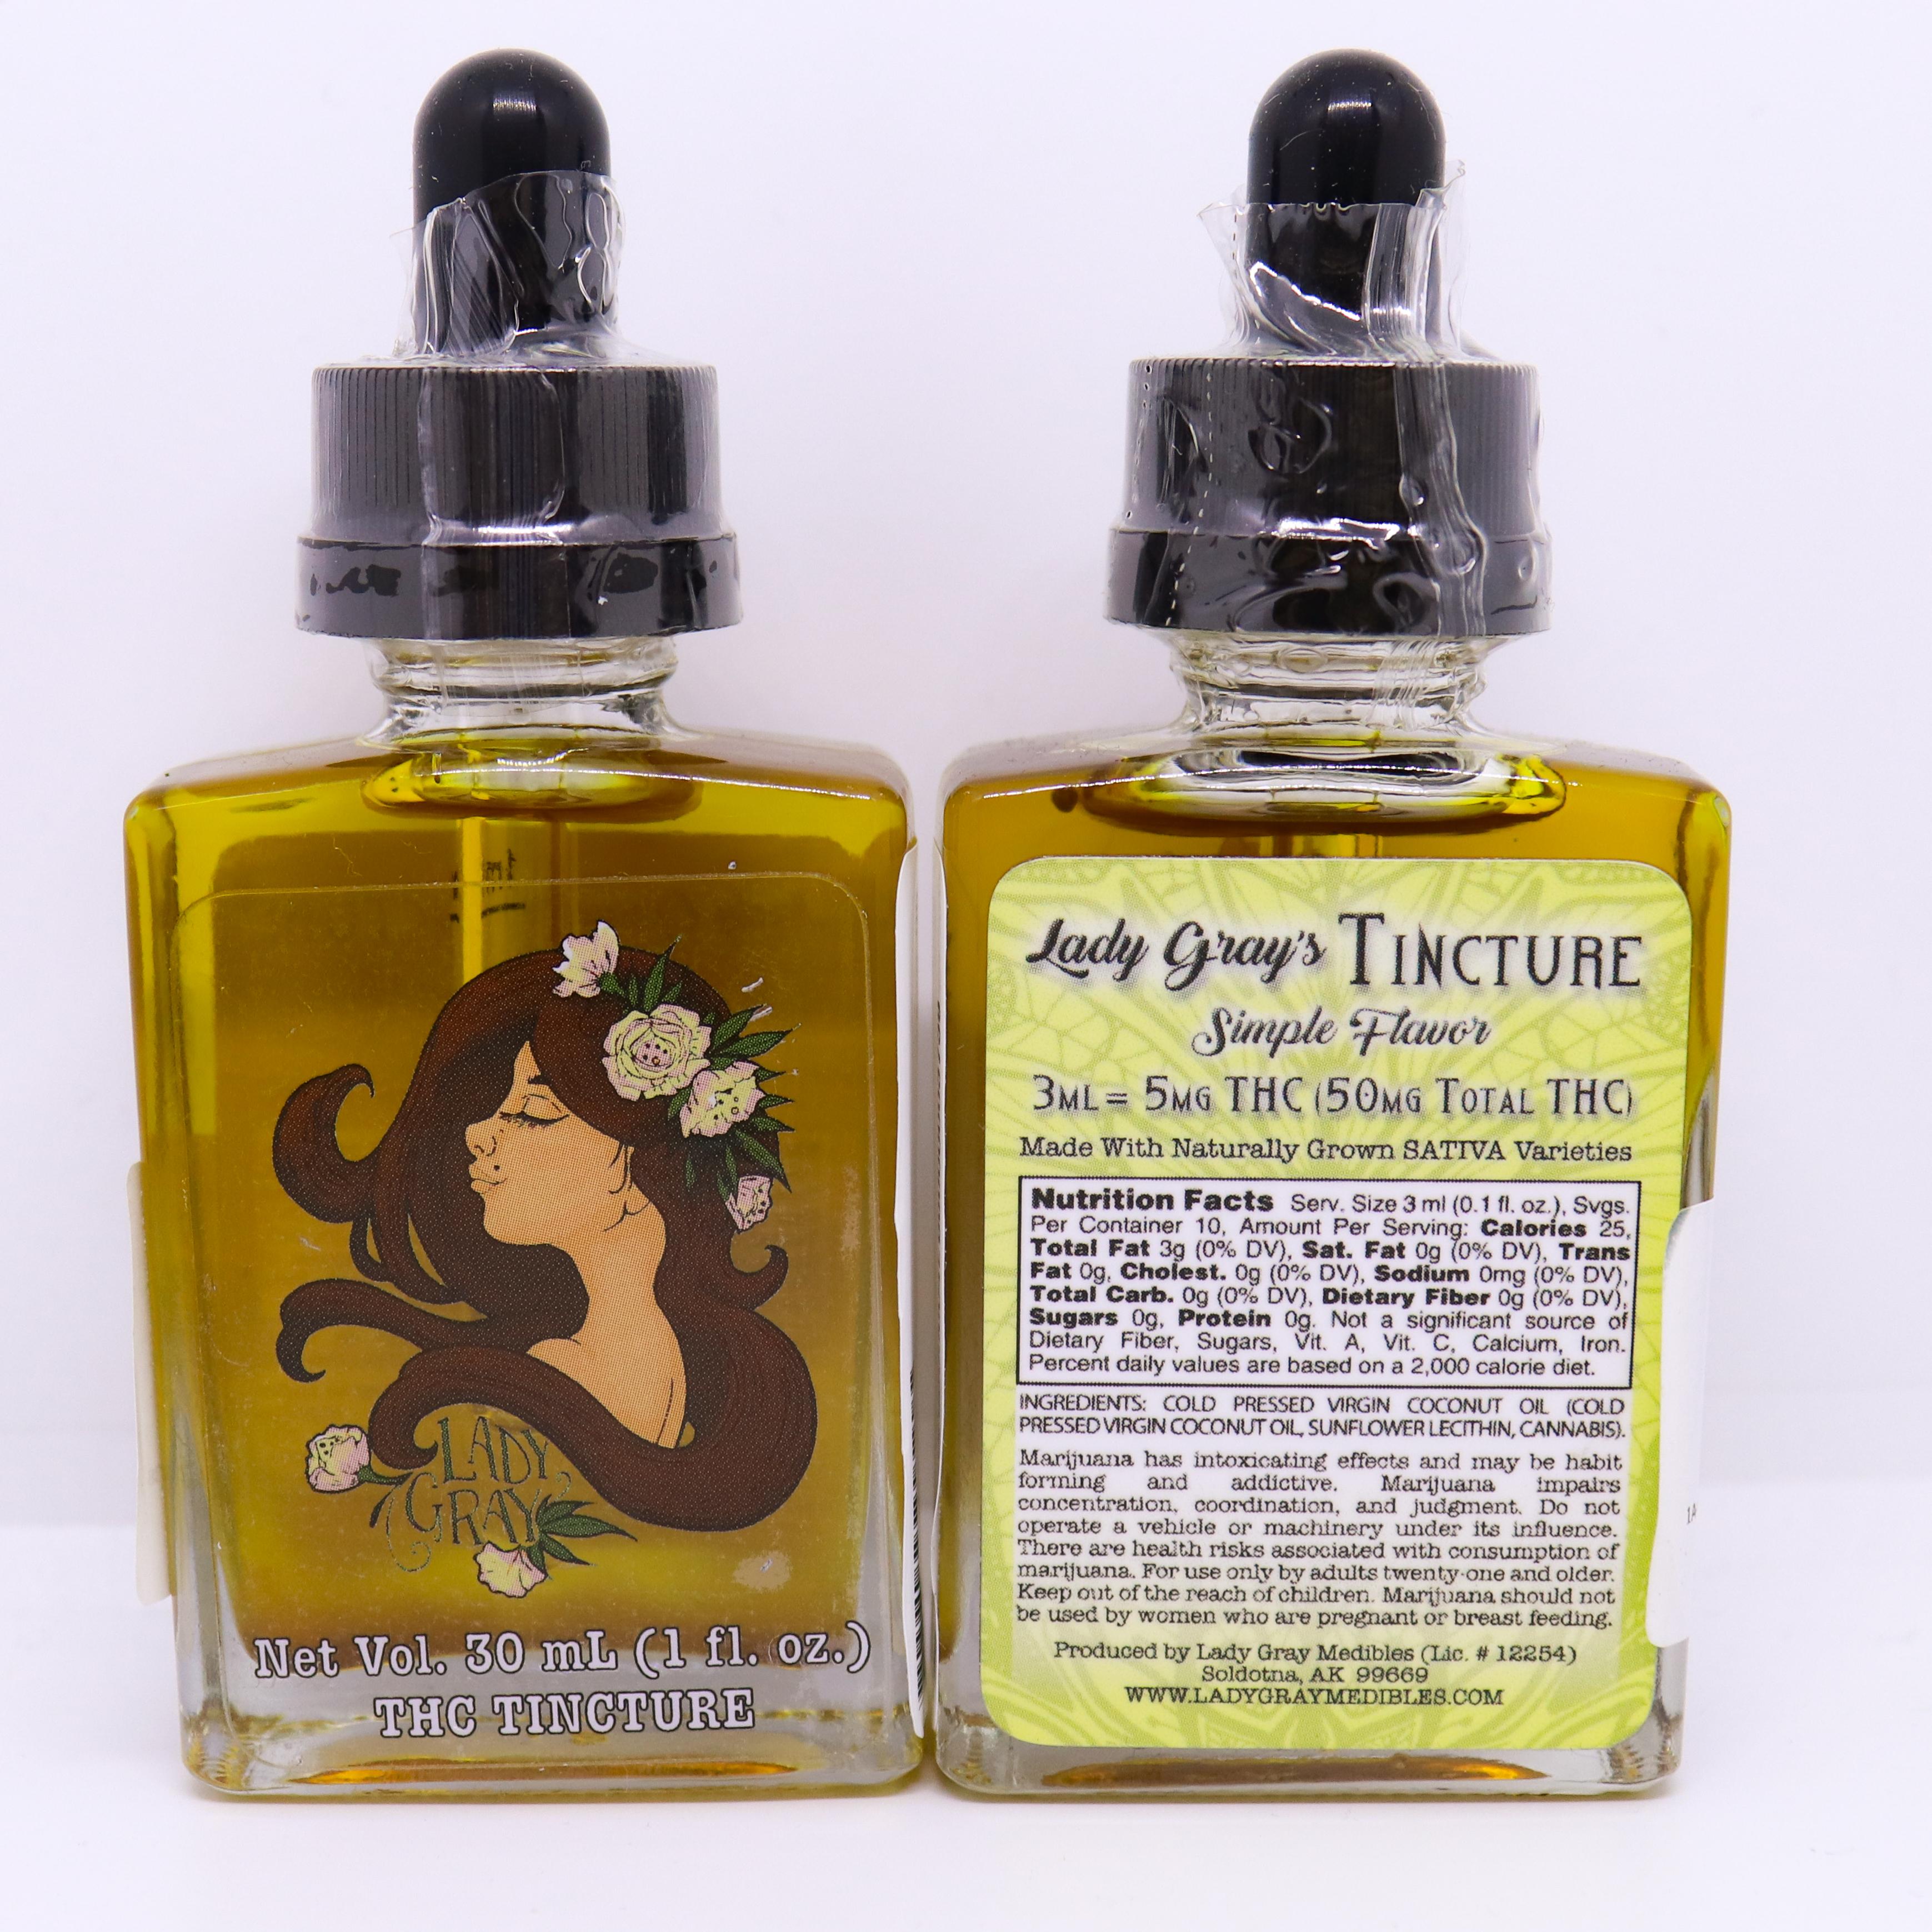 Lady Gray Sativa Tincture